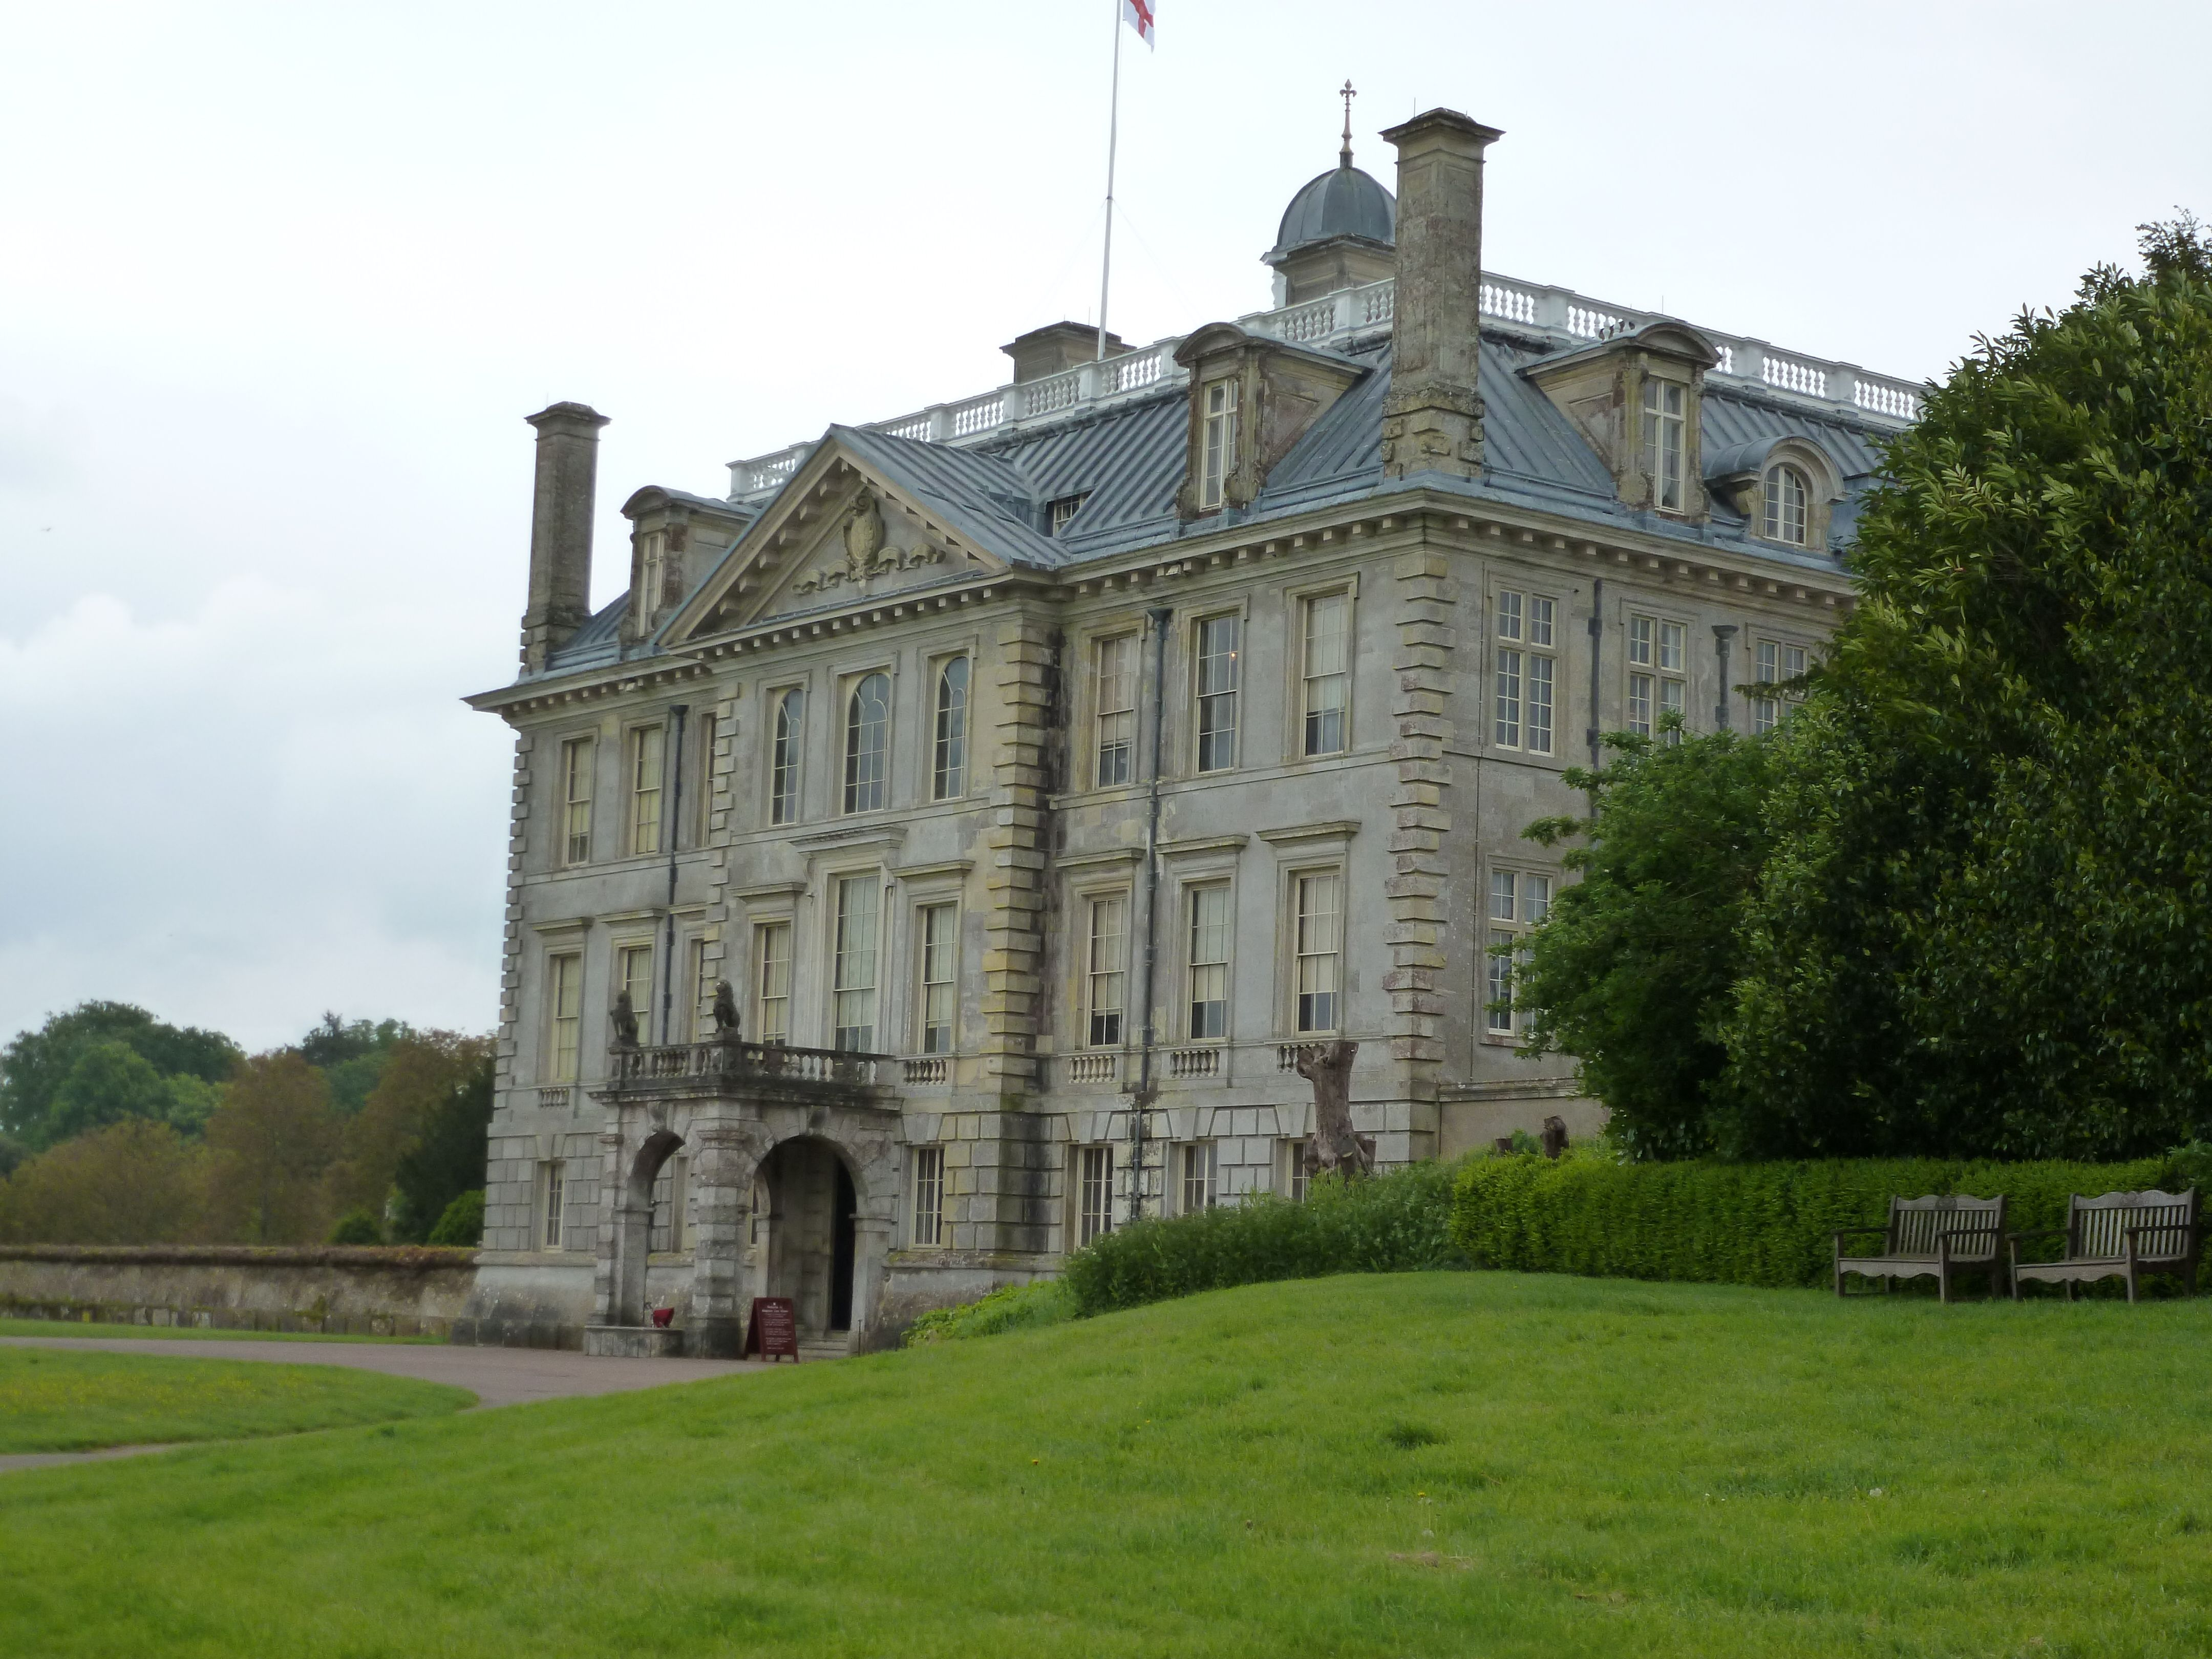 Kingston lacy dorset historical buildings pinterest castles